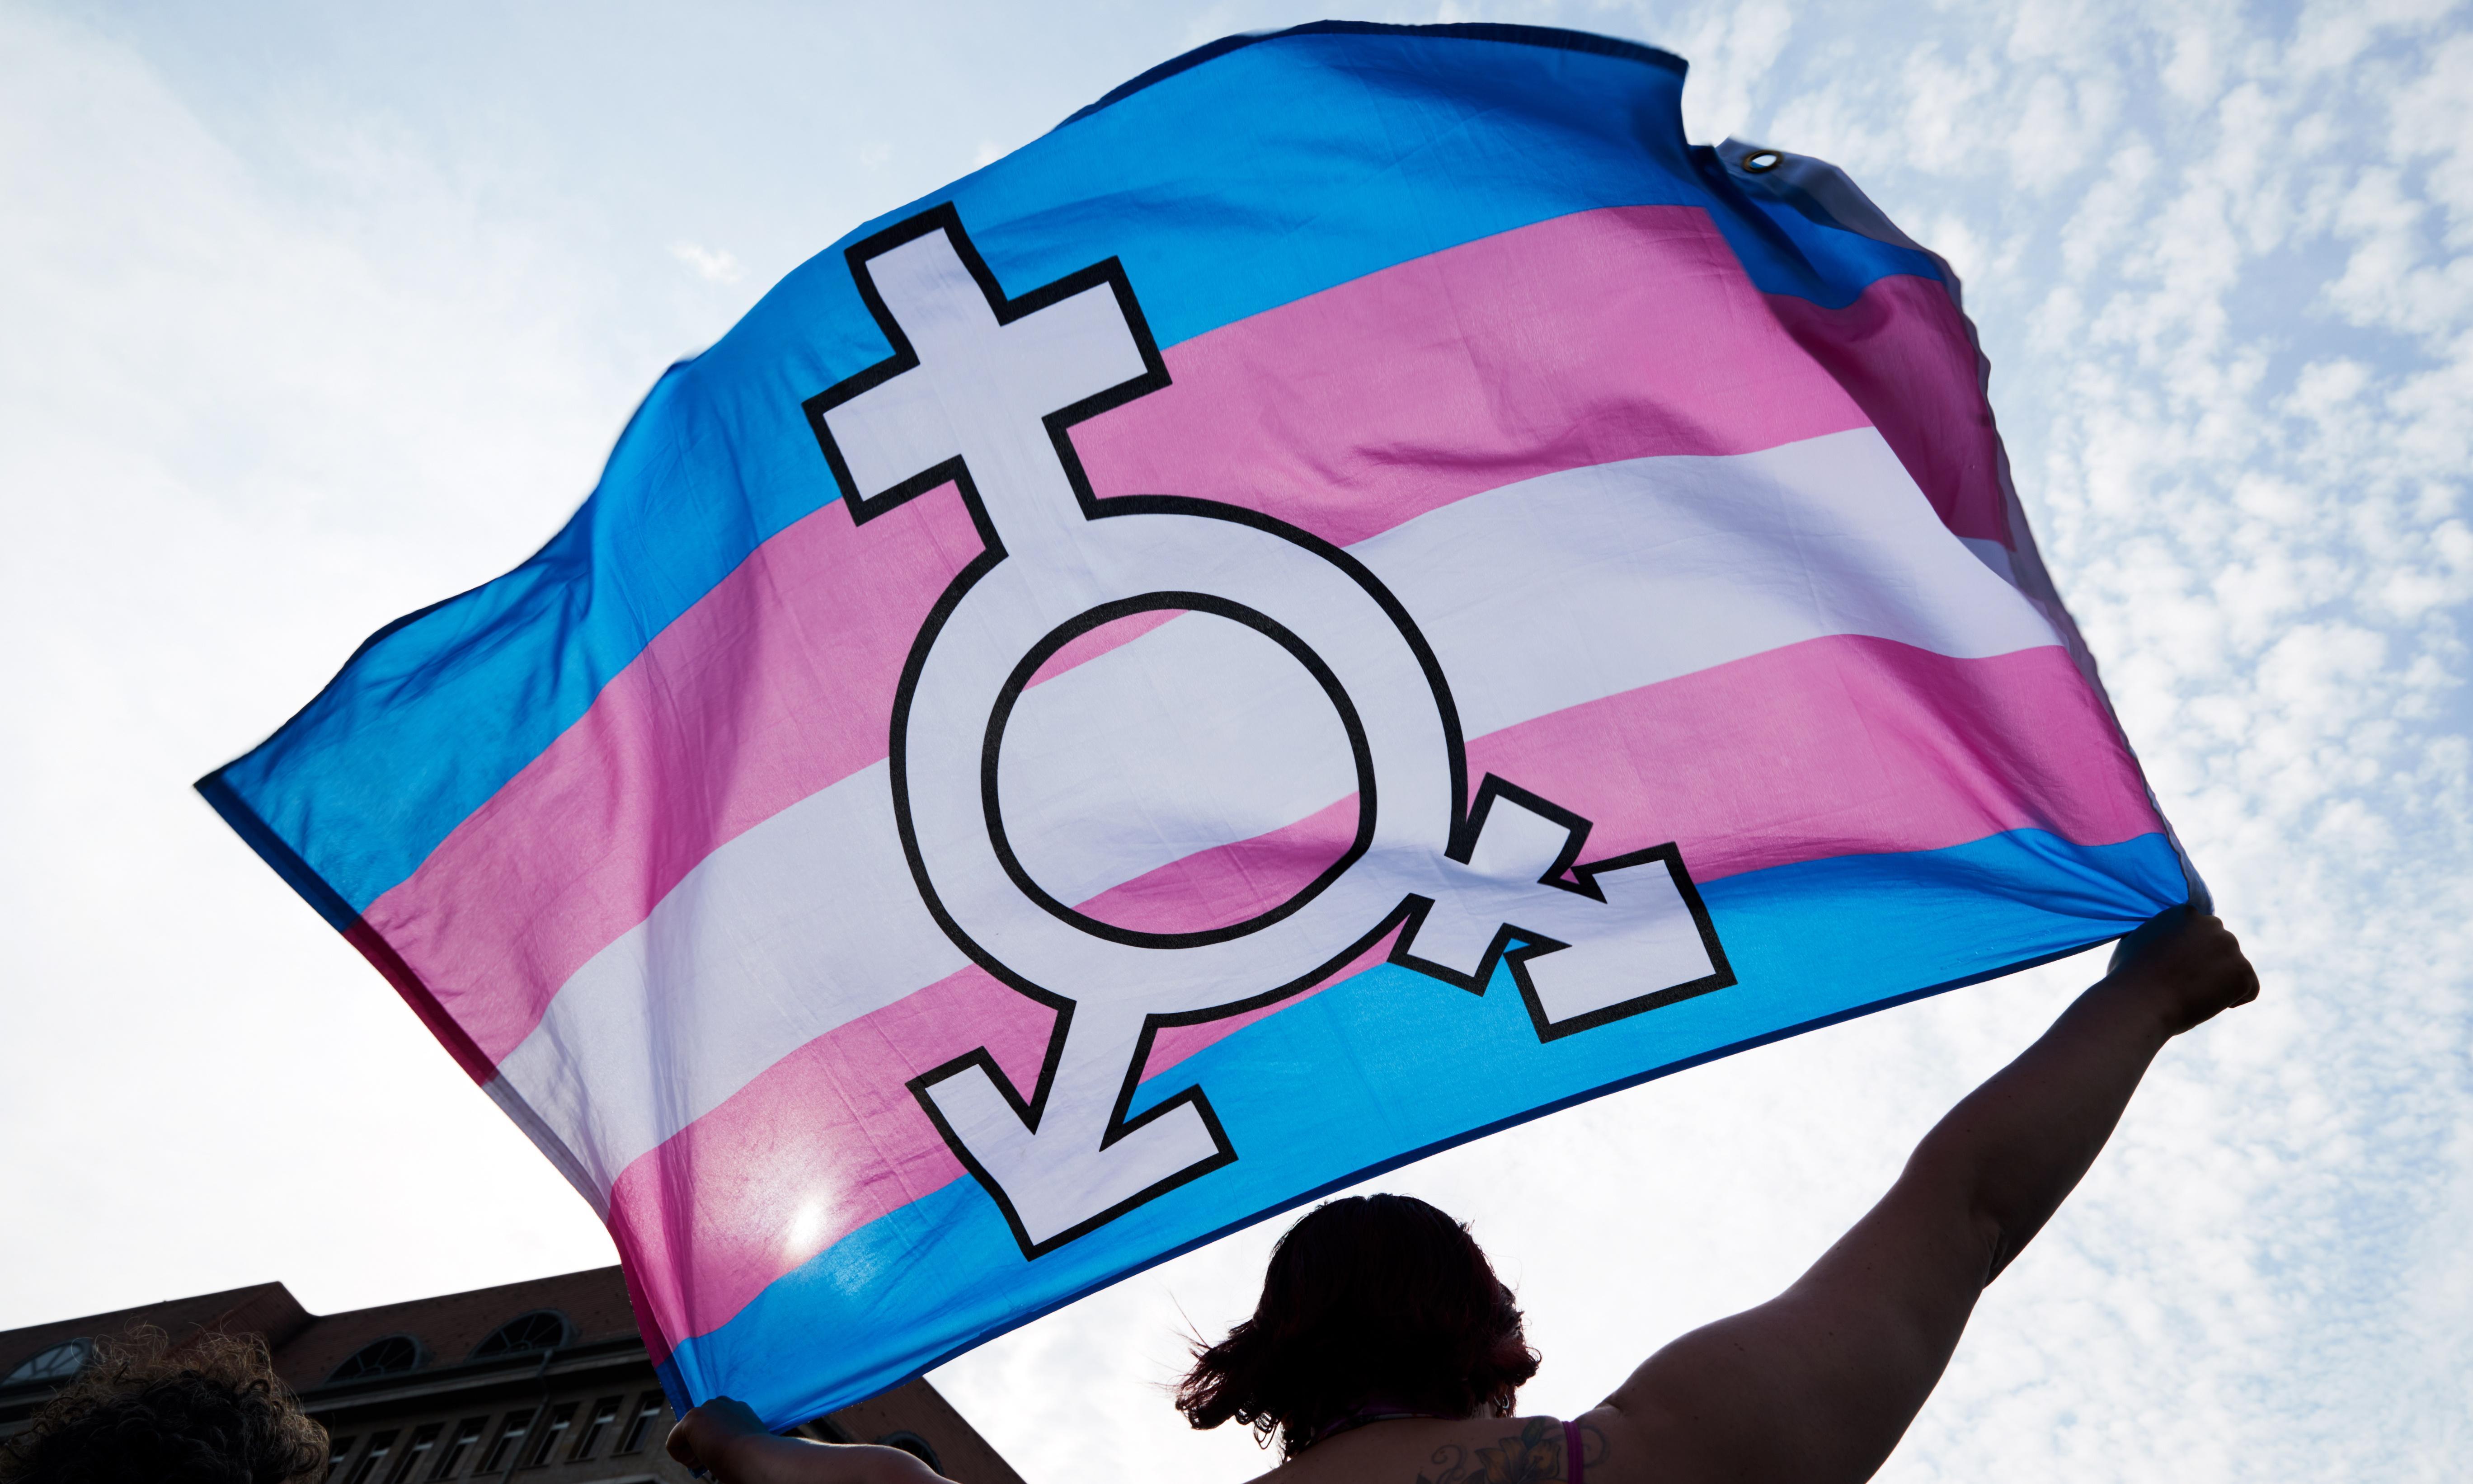 Bringing genetics into trans identity is a terrifying path